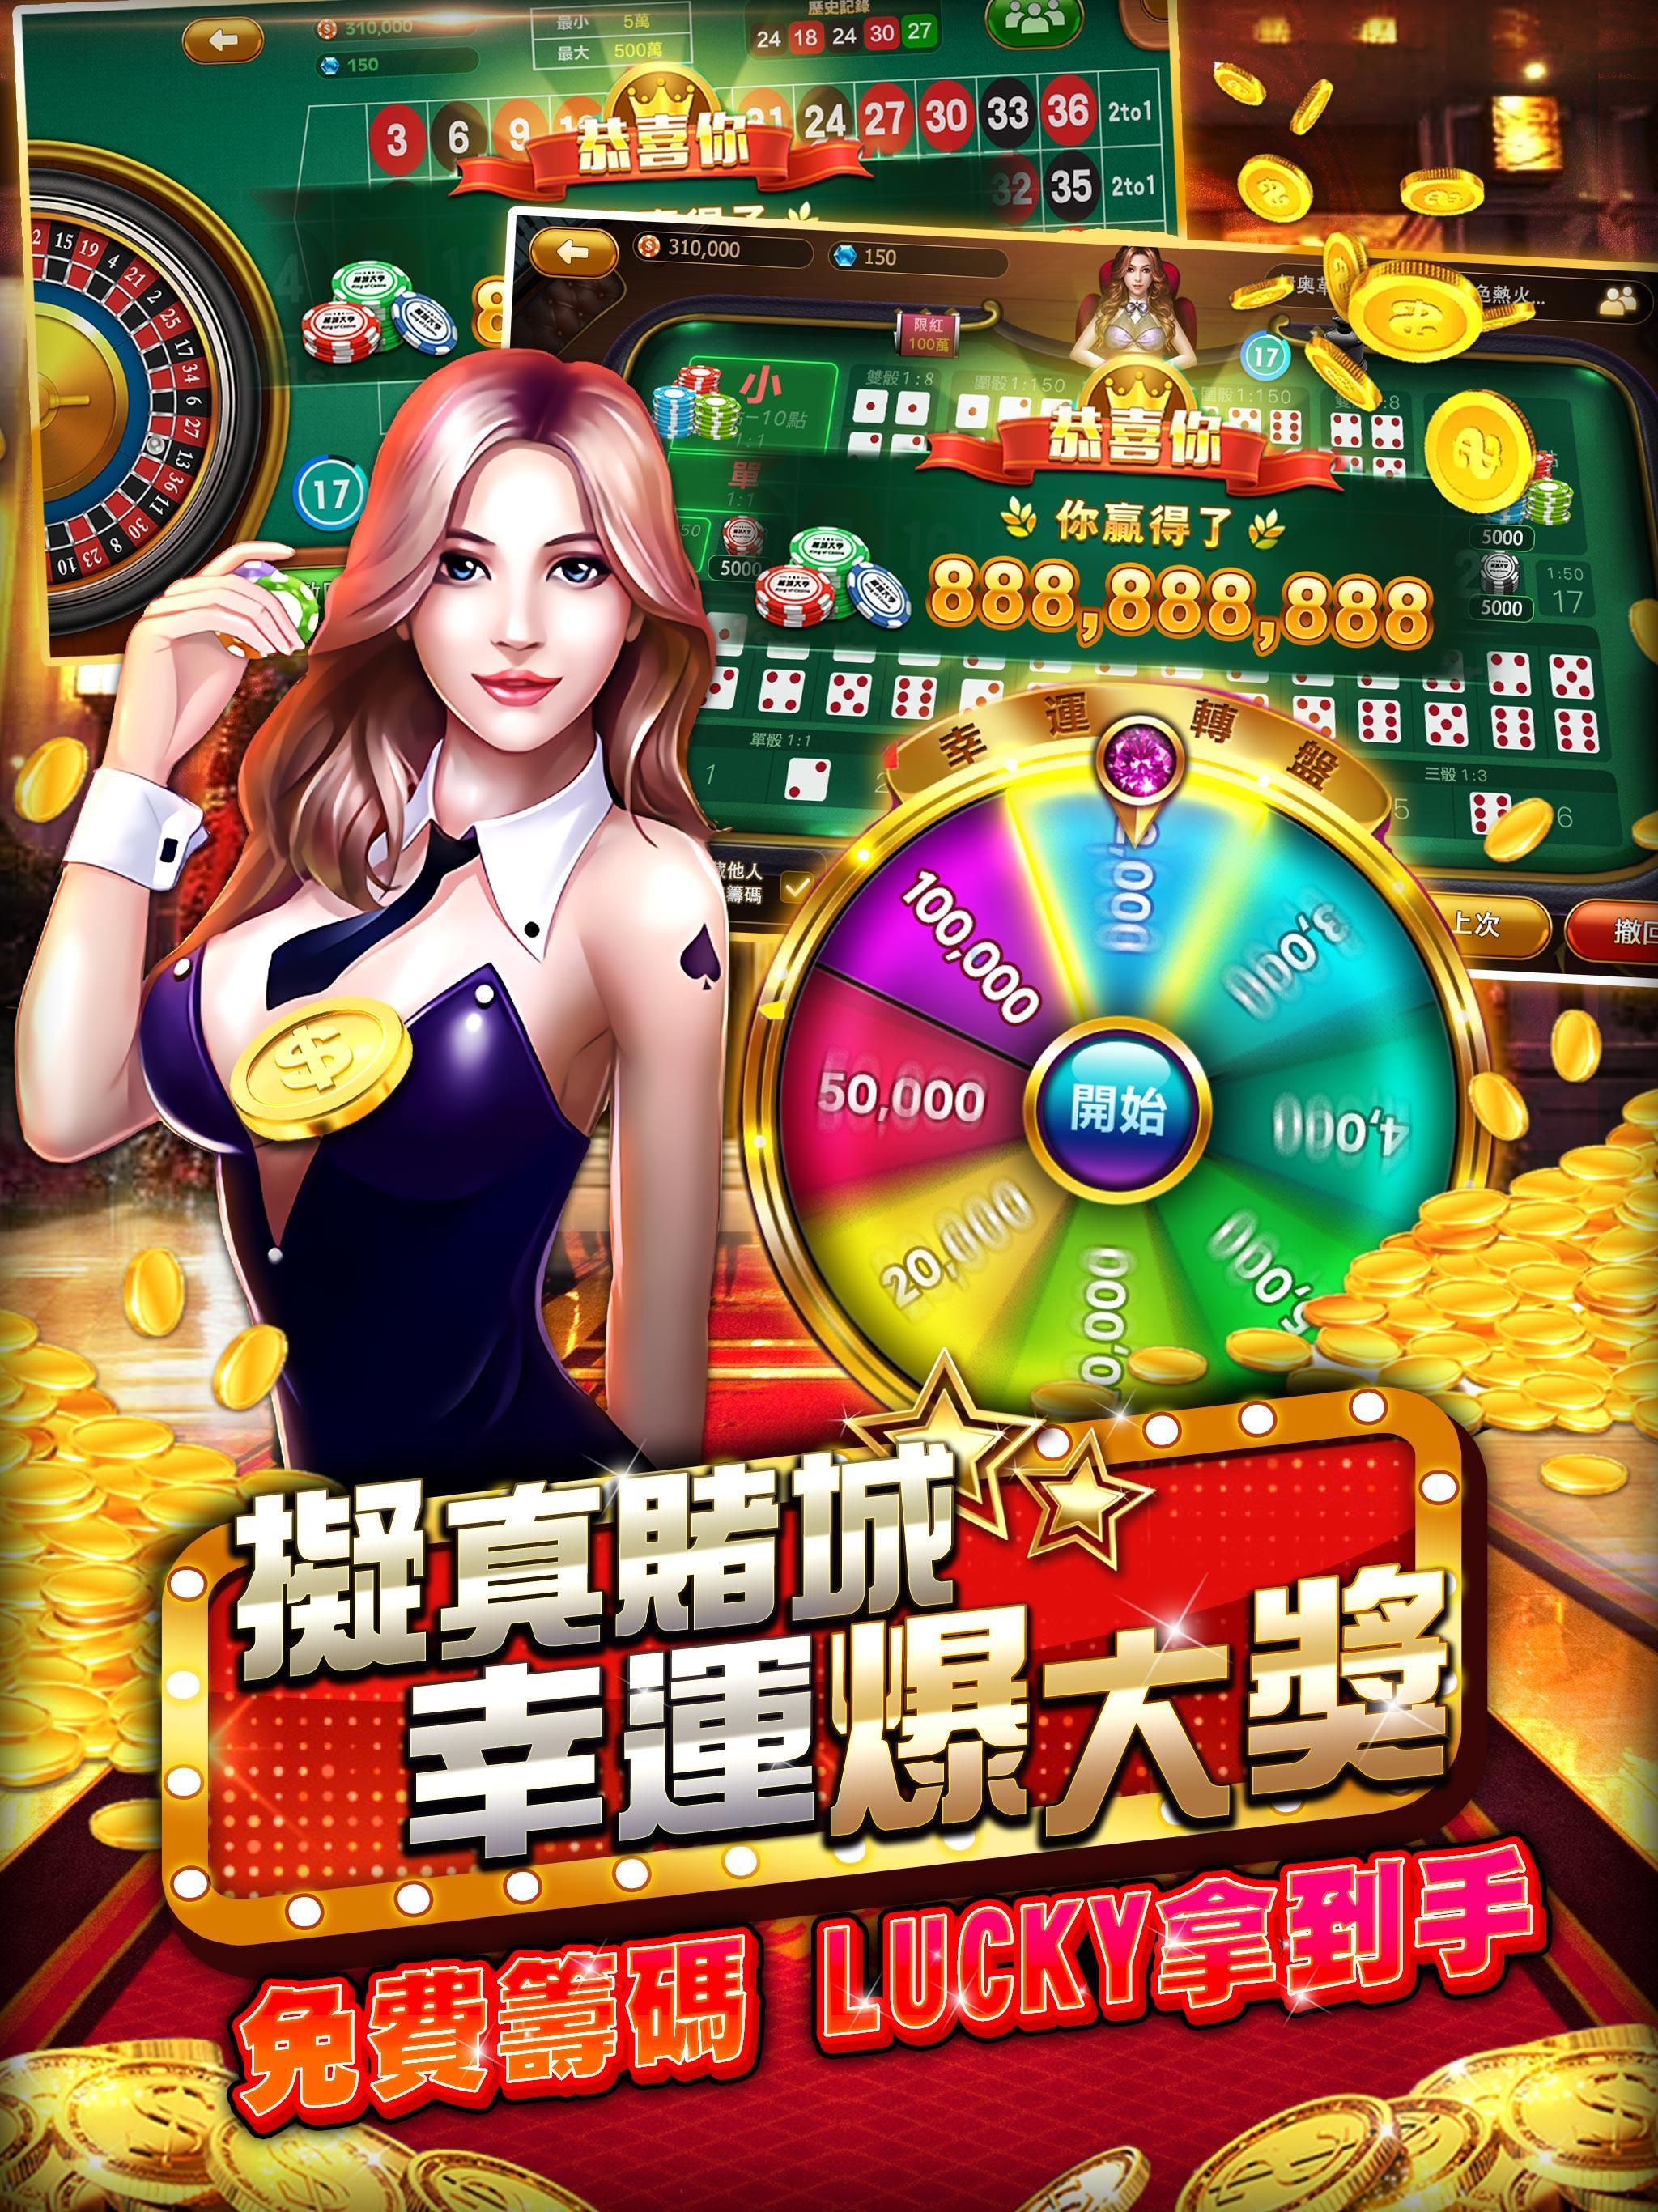 金錢豹娛樂城 2.0.0 Screenshot 10